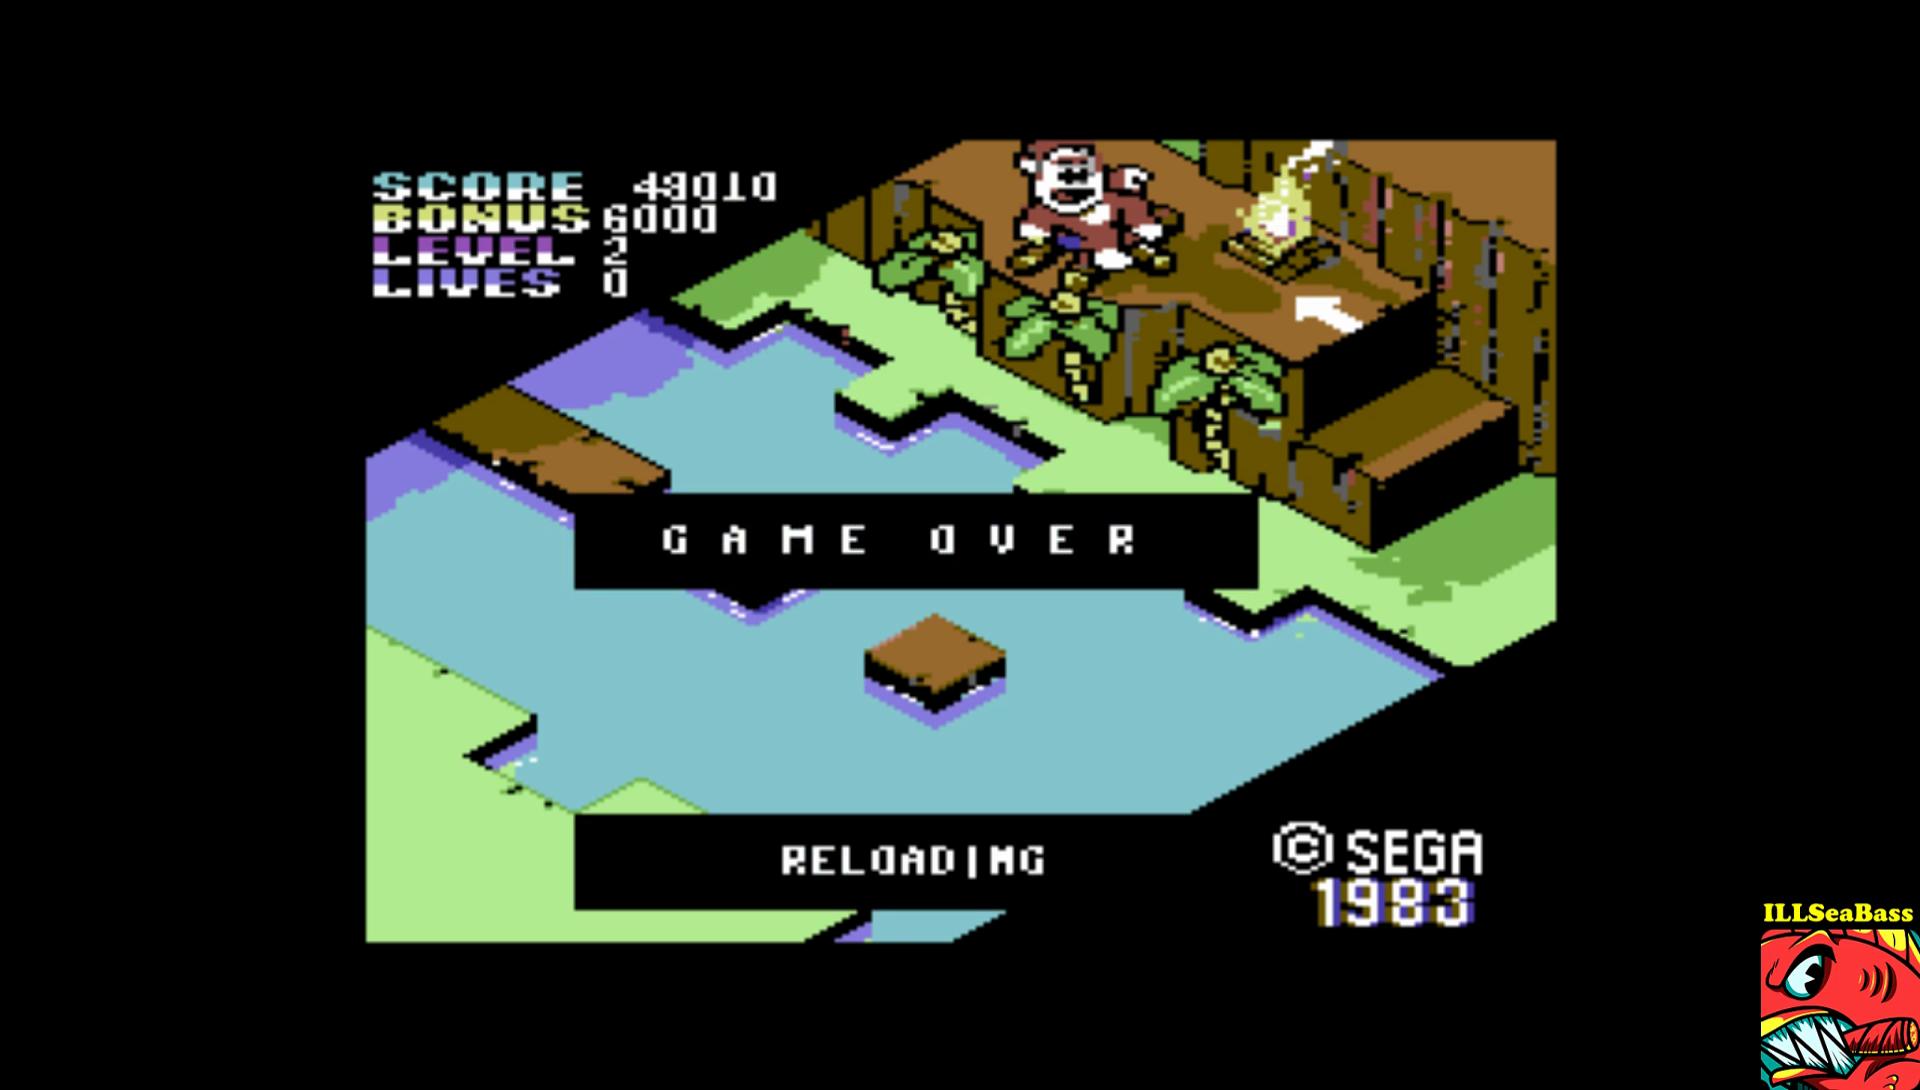 ILLSeaBass: Congo Bongo [1985 Version] (Commodore 64 Emulated) 48,010 points on 2017-01-23 16:56:59